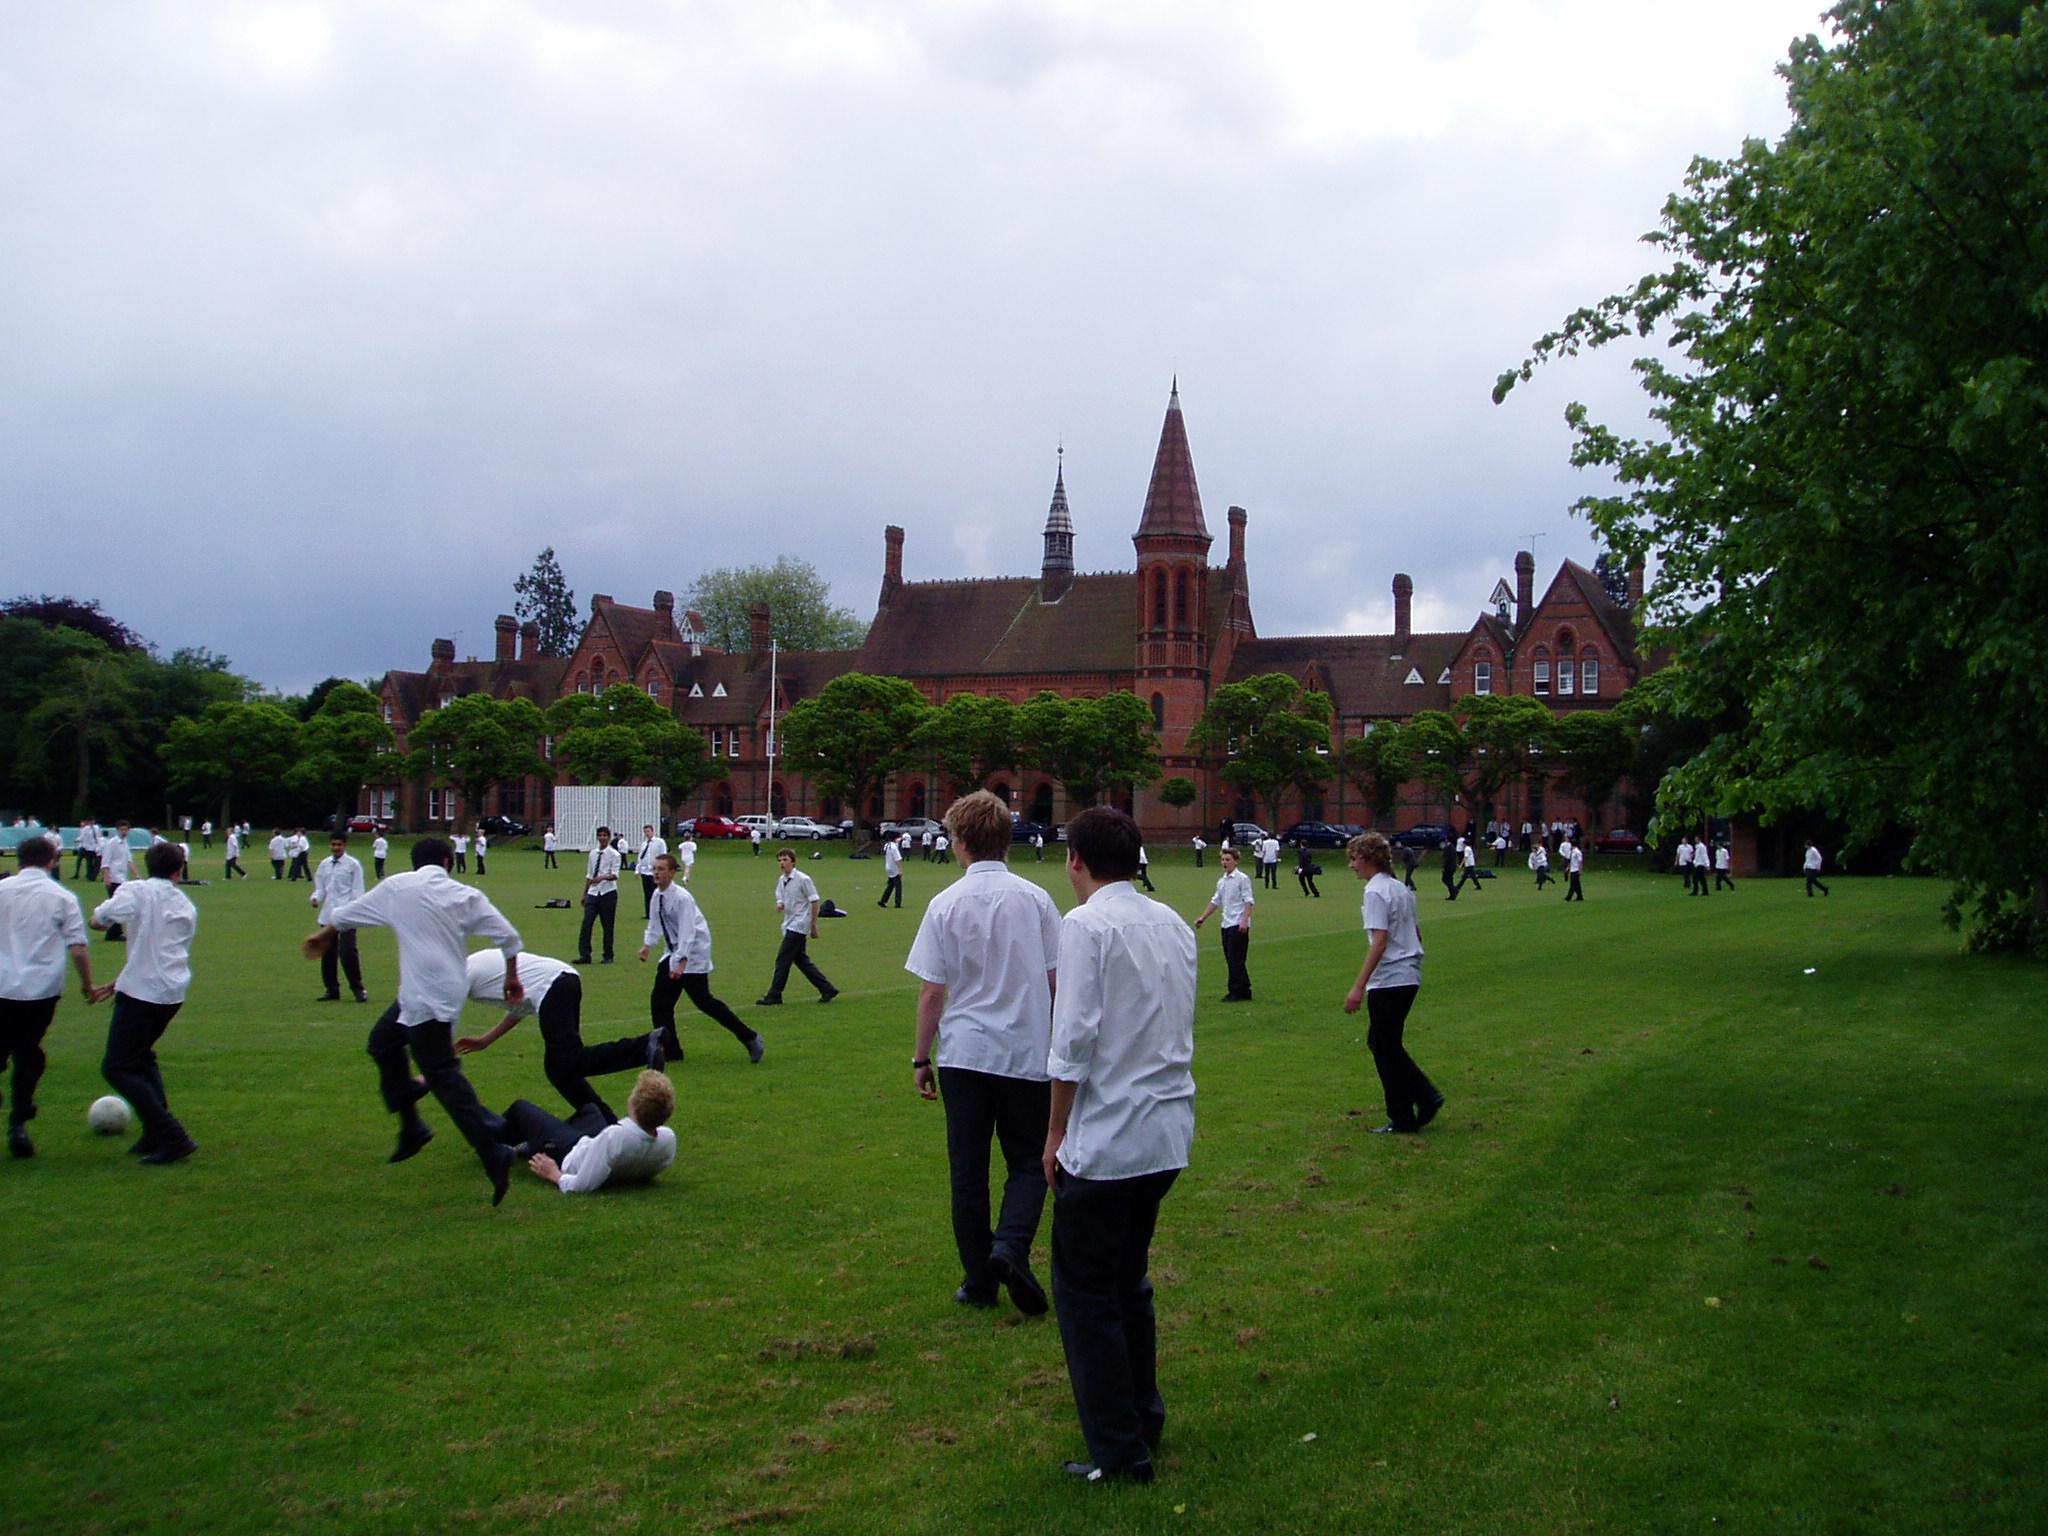 File:Reading school berks uk.jpg - Wikimedia Commons